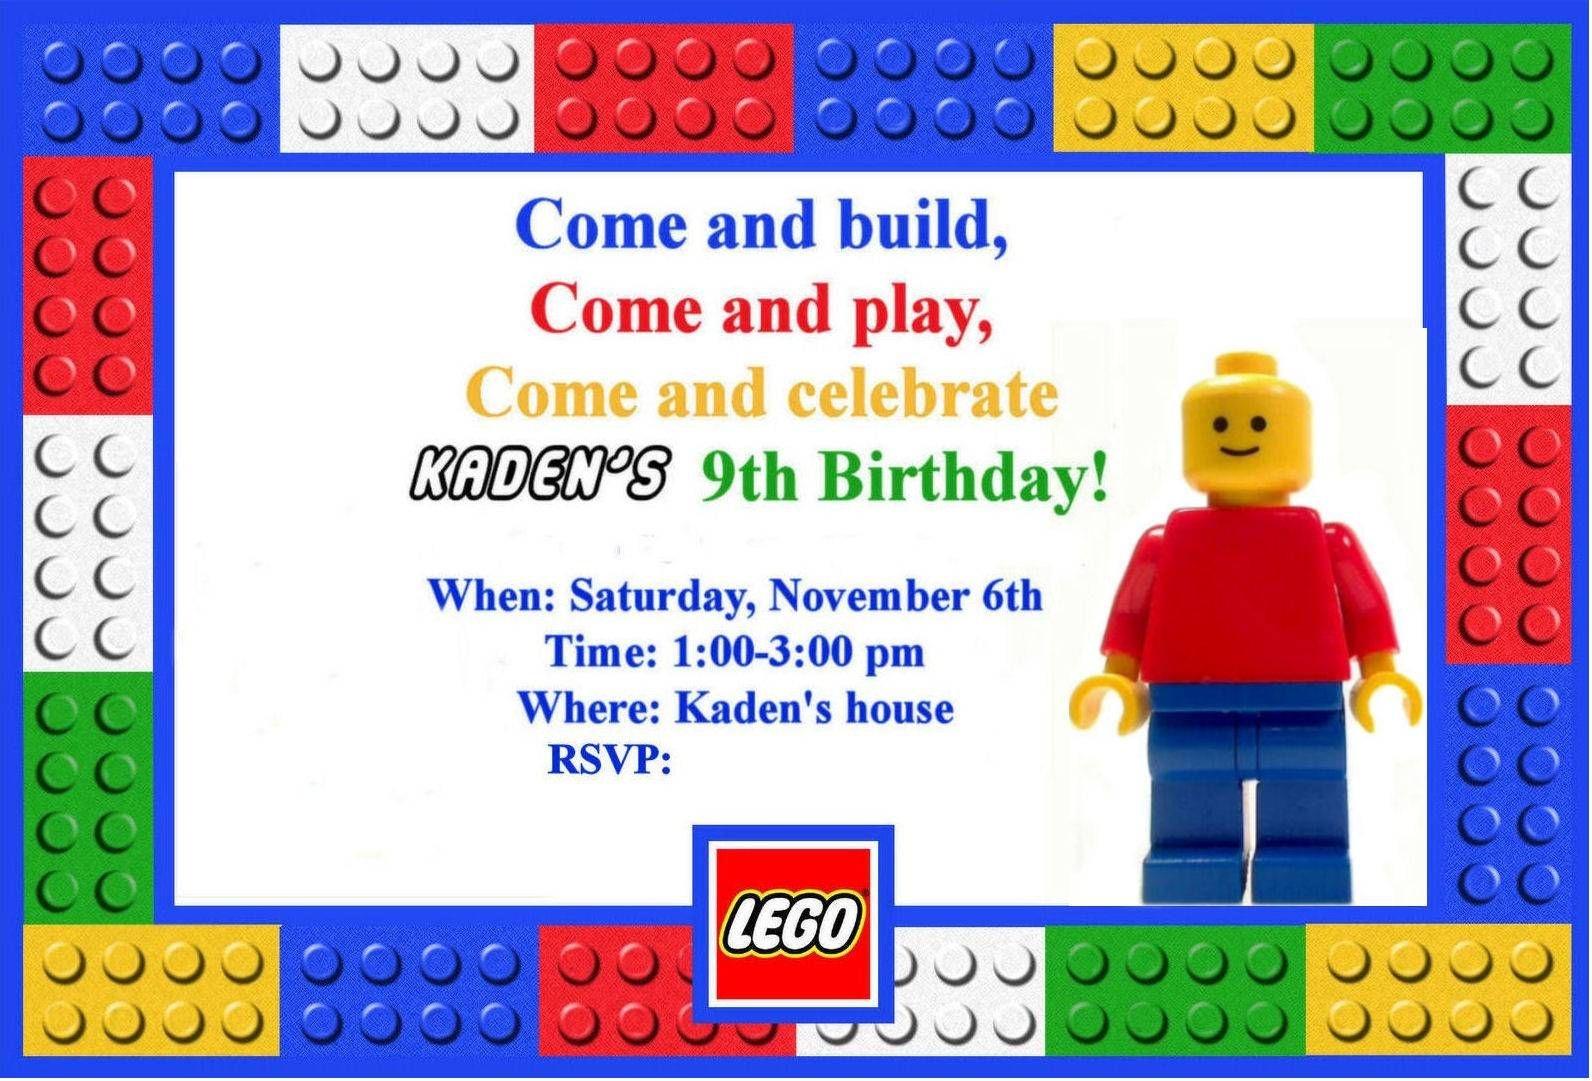 Free Printable Lego Birthday Invitations | Slctn Online - Lego Party Invitations Printable Free